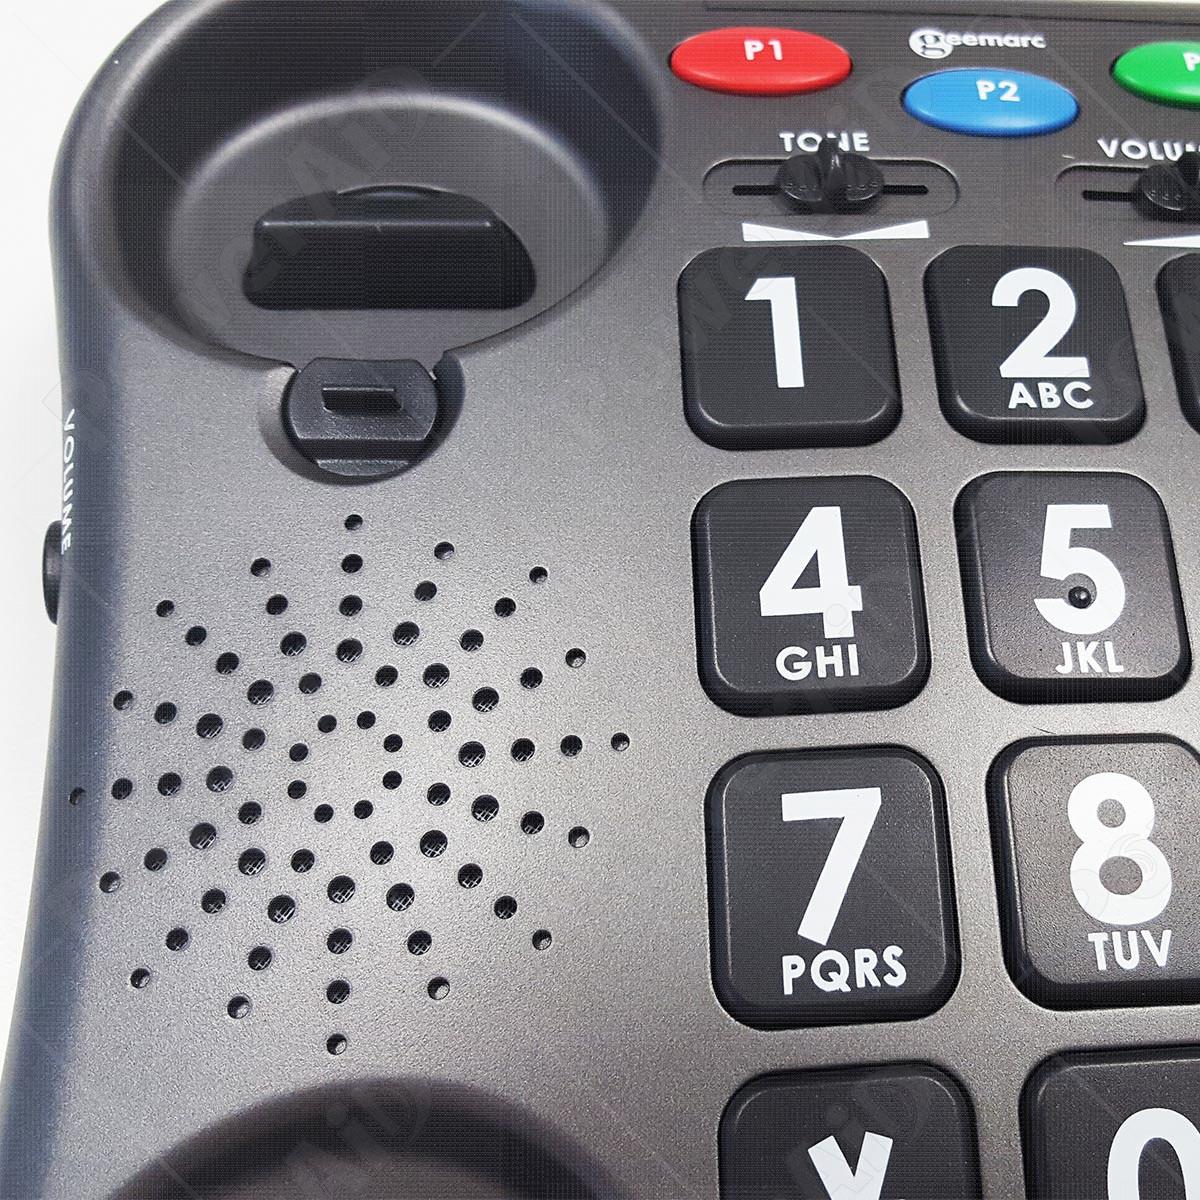 Geemarc - AmpliPOWER 40 Antracite telefono amplificato - Telefoni ... 37eb7ea9affe